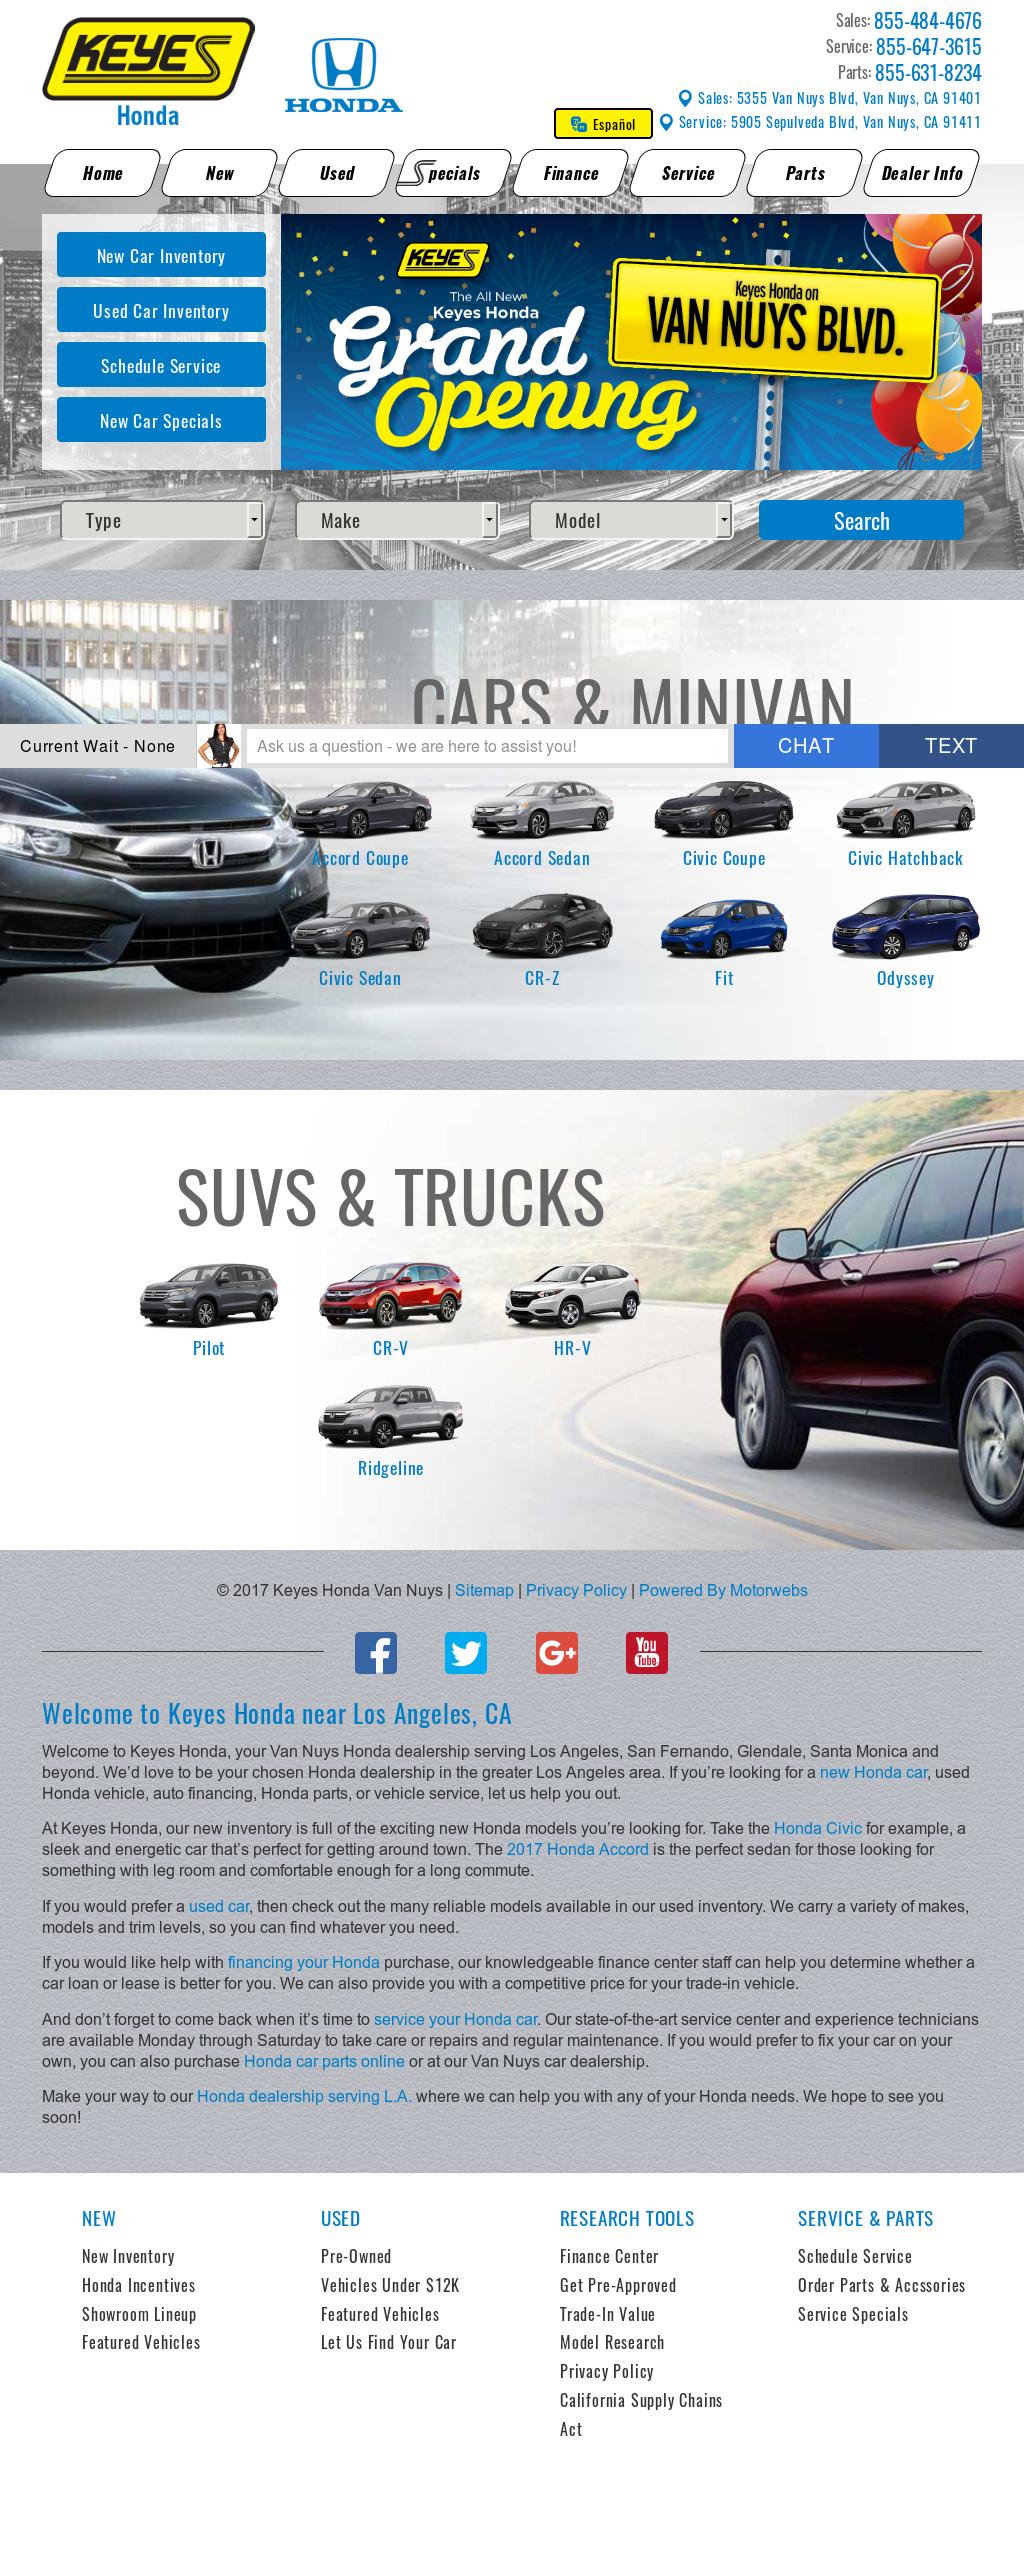 Miller Honda Van Nuys Compeors, Revenue and Employees - Owler ...